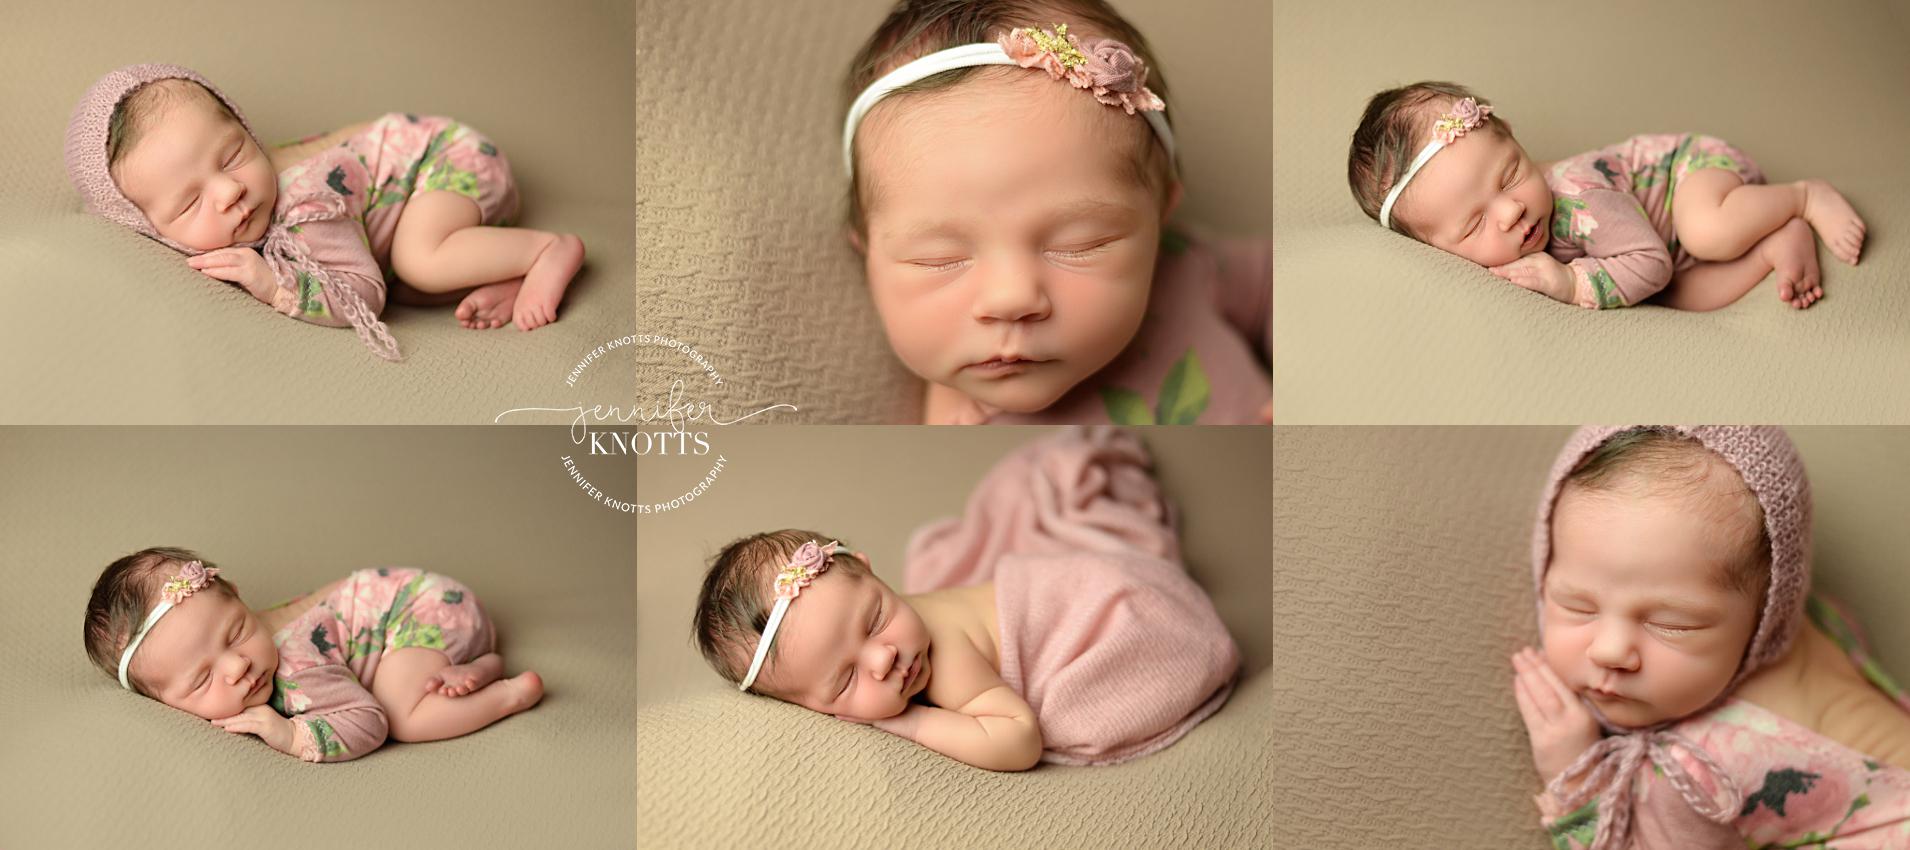 Baby girl sleeps on tan fabric wearing floral romper